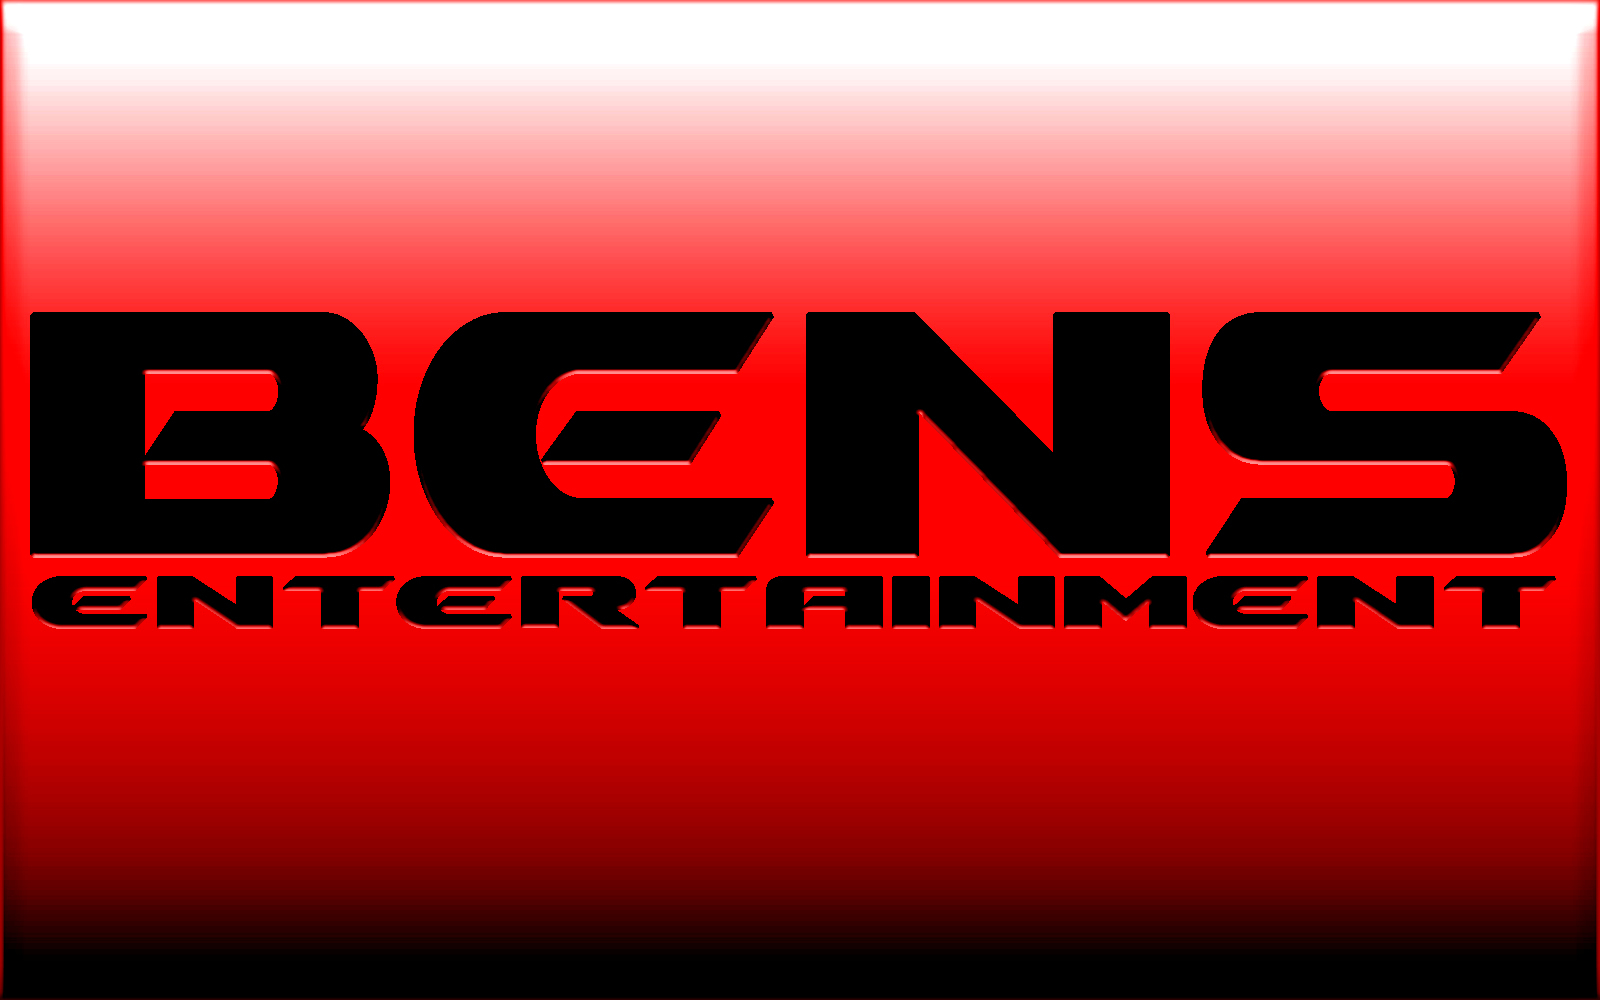 Bens Entertainment